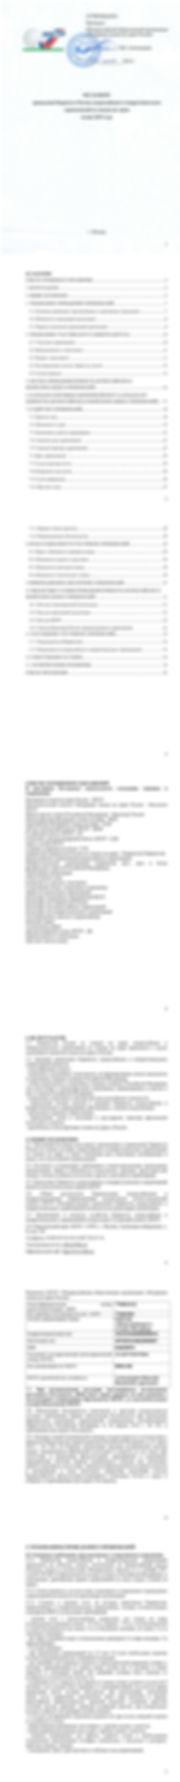 регламент 1.7.jpg